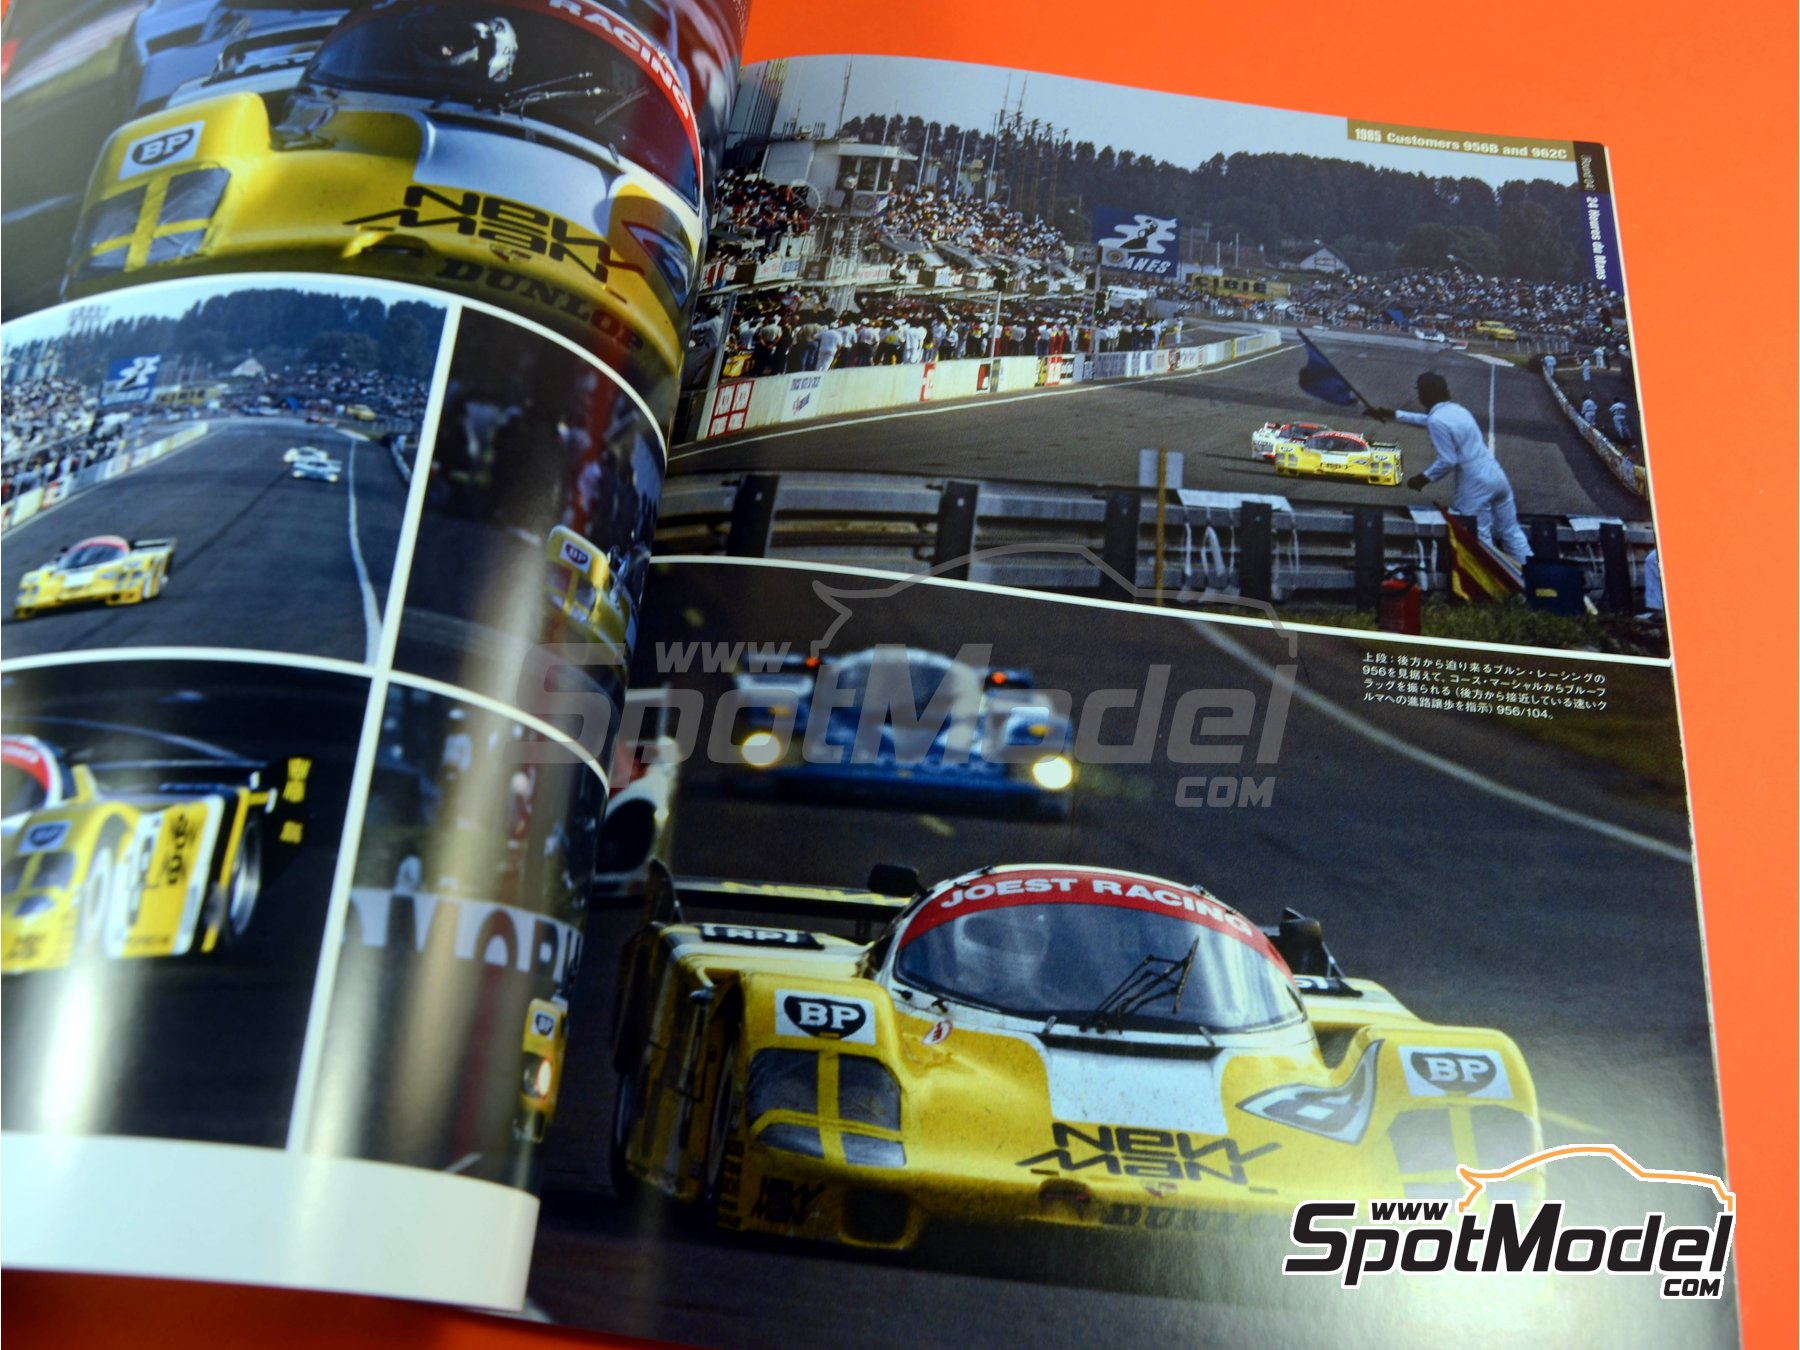 Image 9: Joe Honda Sportscar Spectacles - Porsche 956 - 24 Horas de Le Mans, 1000 Kilómetros de Suzuka, 6 Horas de Silverstone, 6 Horas de Fuji 1982, 1983, 1984, 1985 y 1985 | Libro de referencia fabricado por Model Factory Hiro (ref.MFH-SS007)